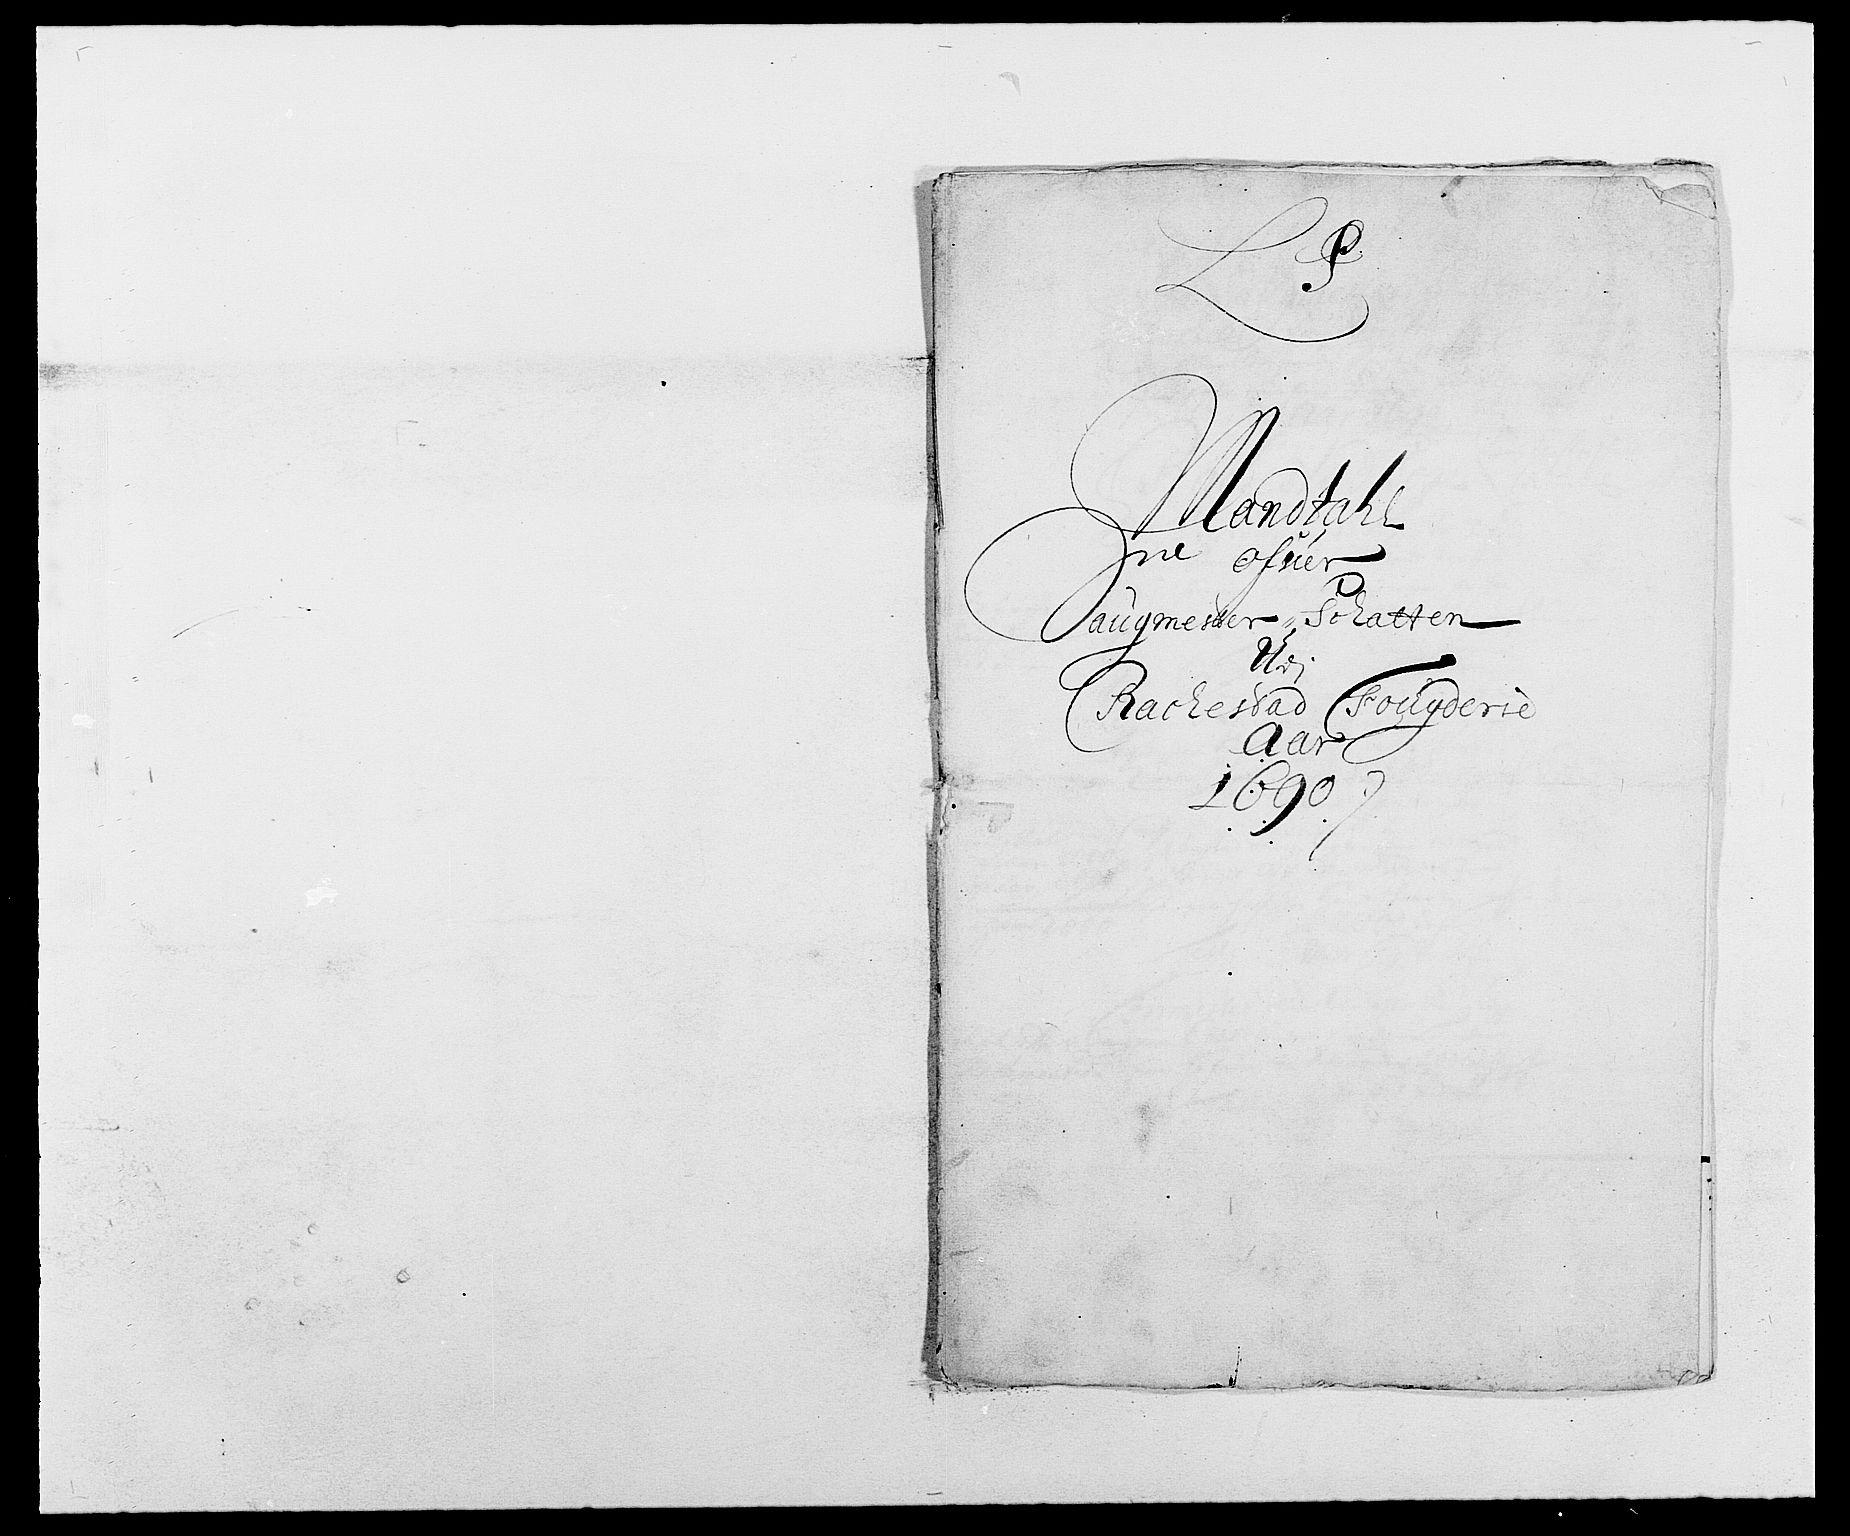 RA, Rentekammeret inntil 1814, Reviderte regnskaper, Fogderegnskap, R05/L0277: Fogderegnskap Rakkestad, 1689-1690, s. 293